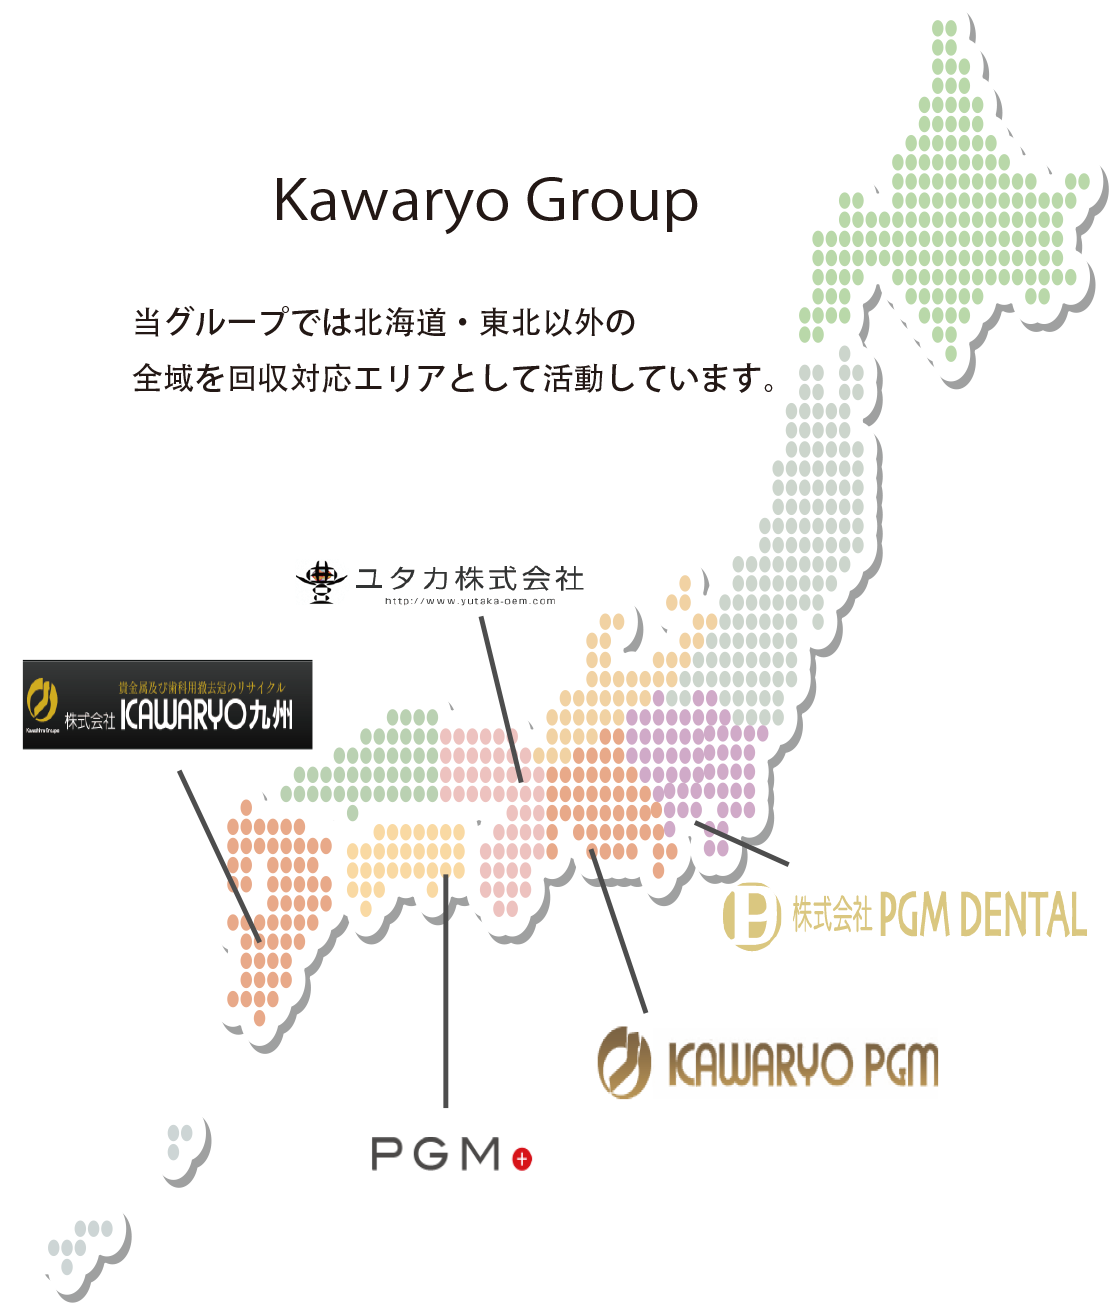 Kawaryo Group 当グループでは北海道·東北以外の全域を回収対応エリアとして活動しています。